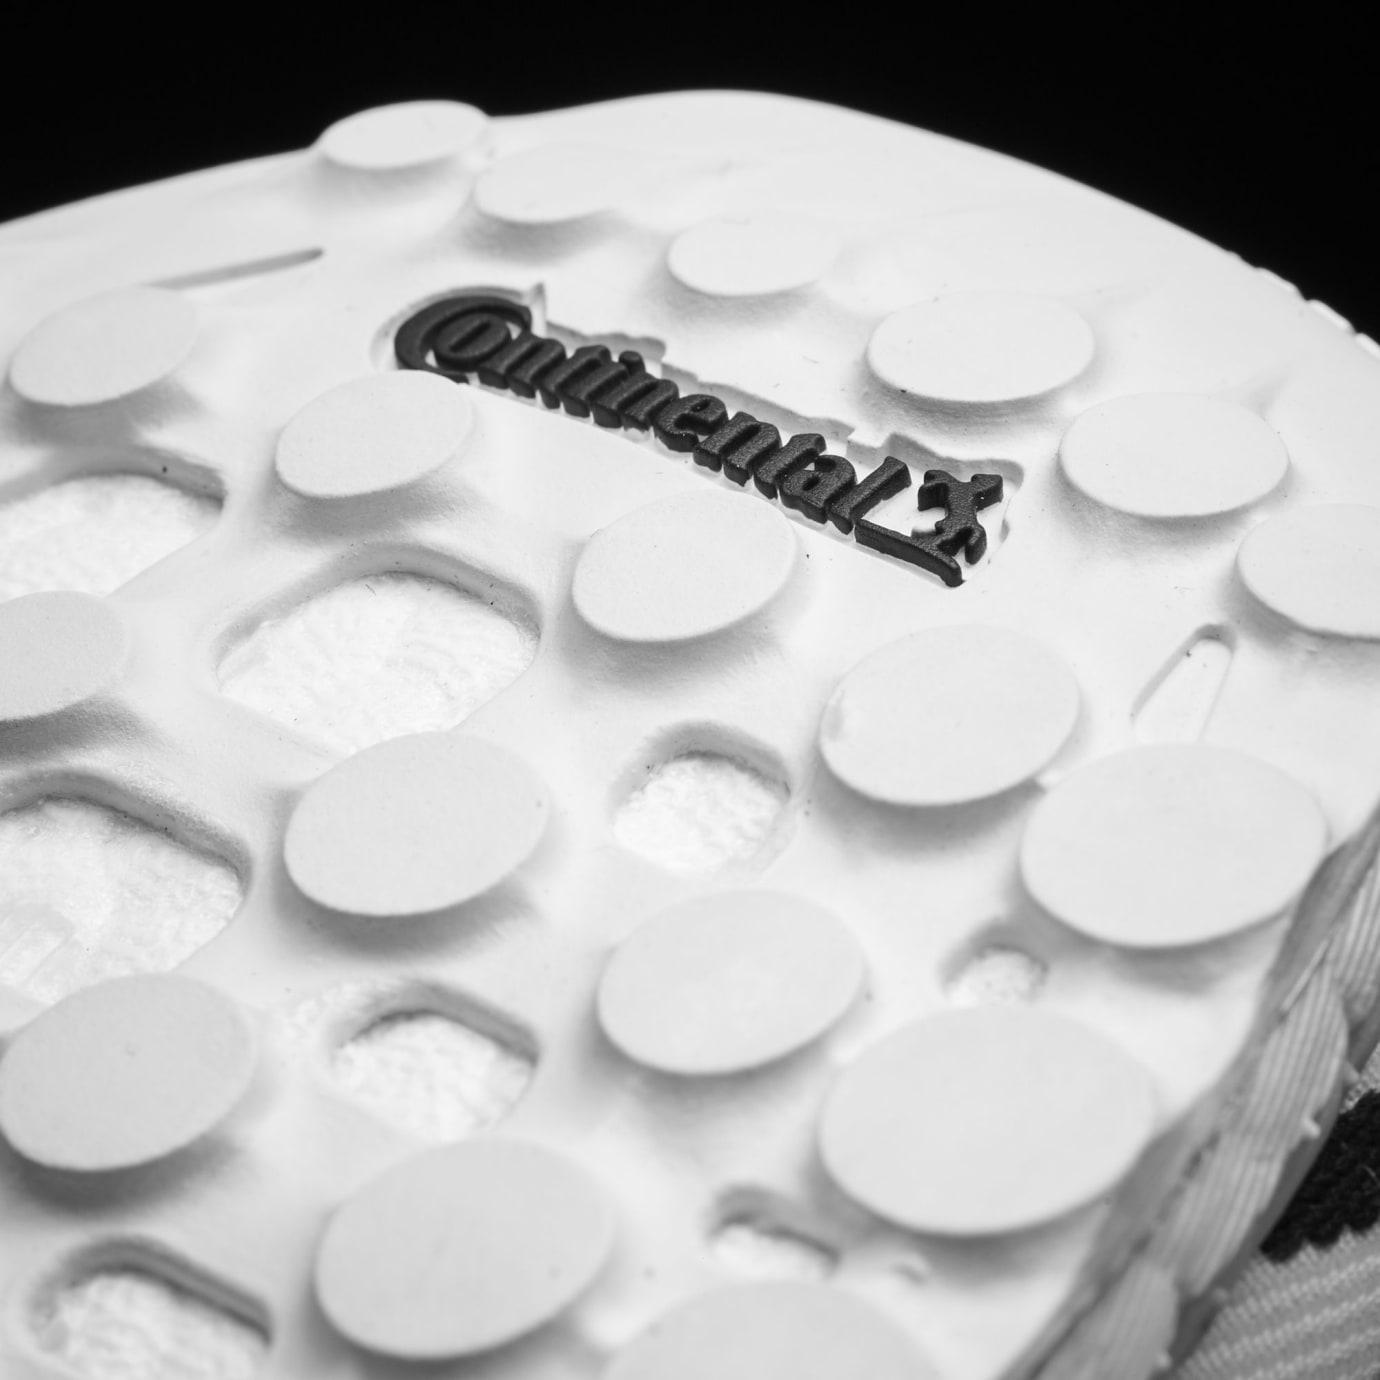 Adidas Nemeziz Tango 17+ 360 Agility 'Running White/Running White/ Core Black' CG3656 (Outsole)